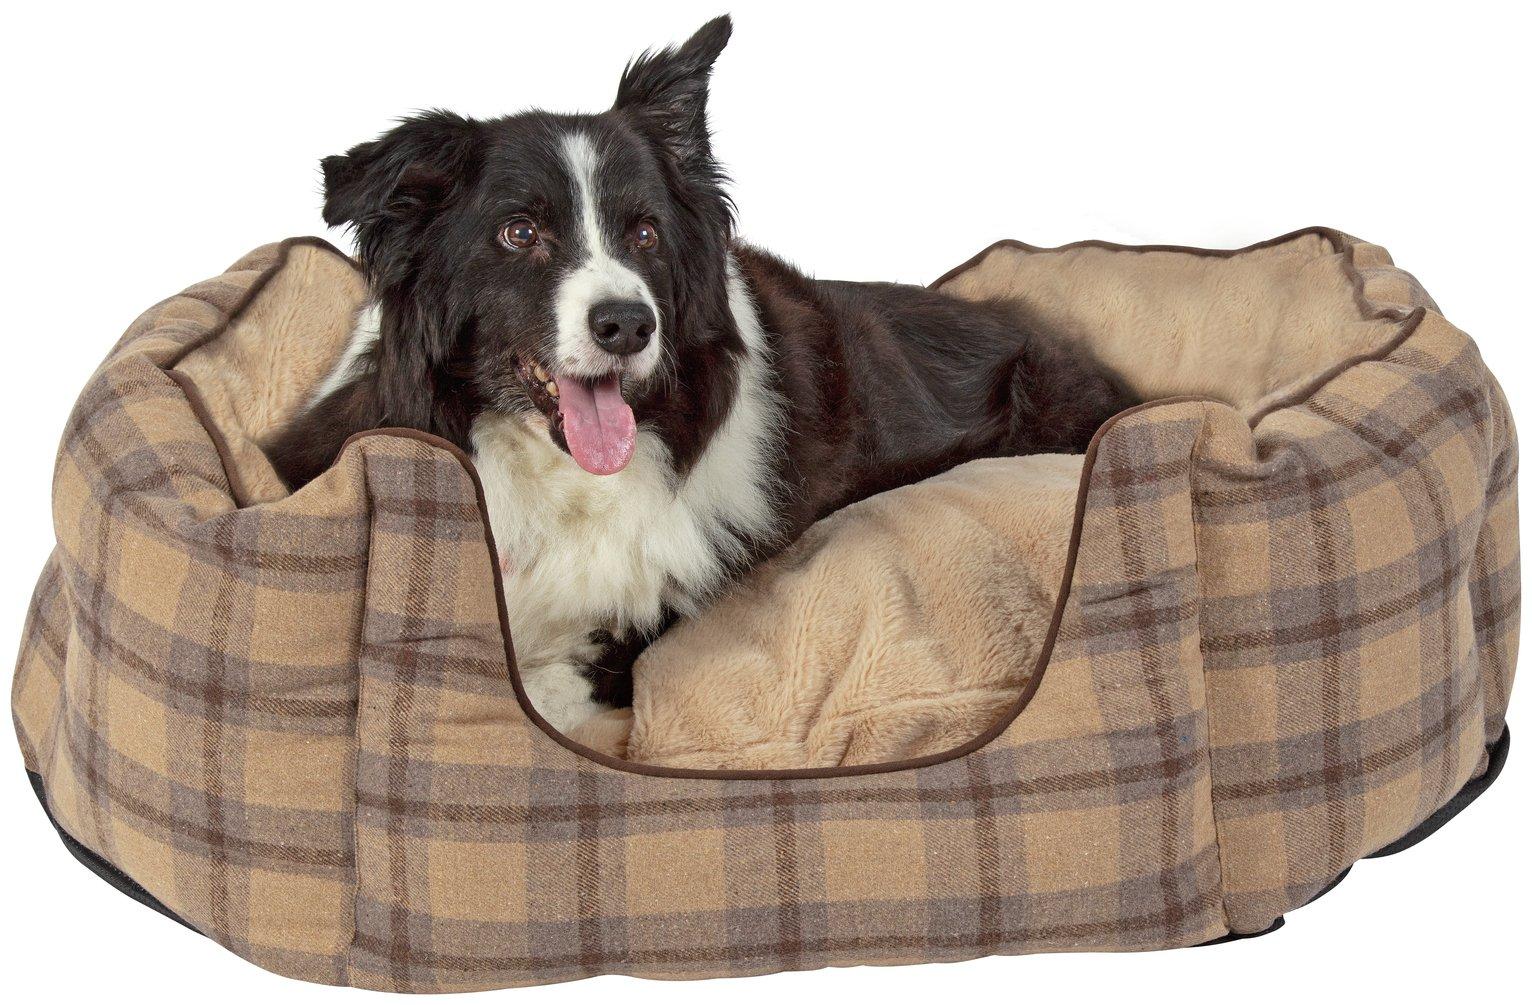 Pineham Memory Foam Oval Pet Bed - X Large